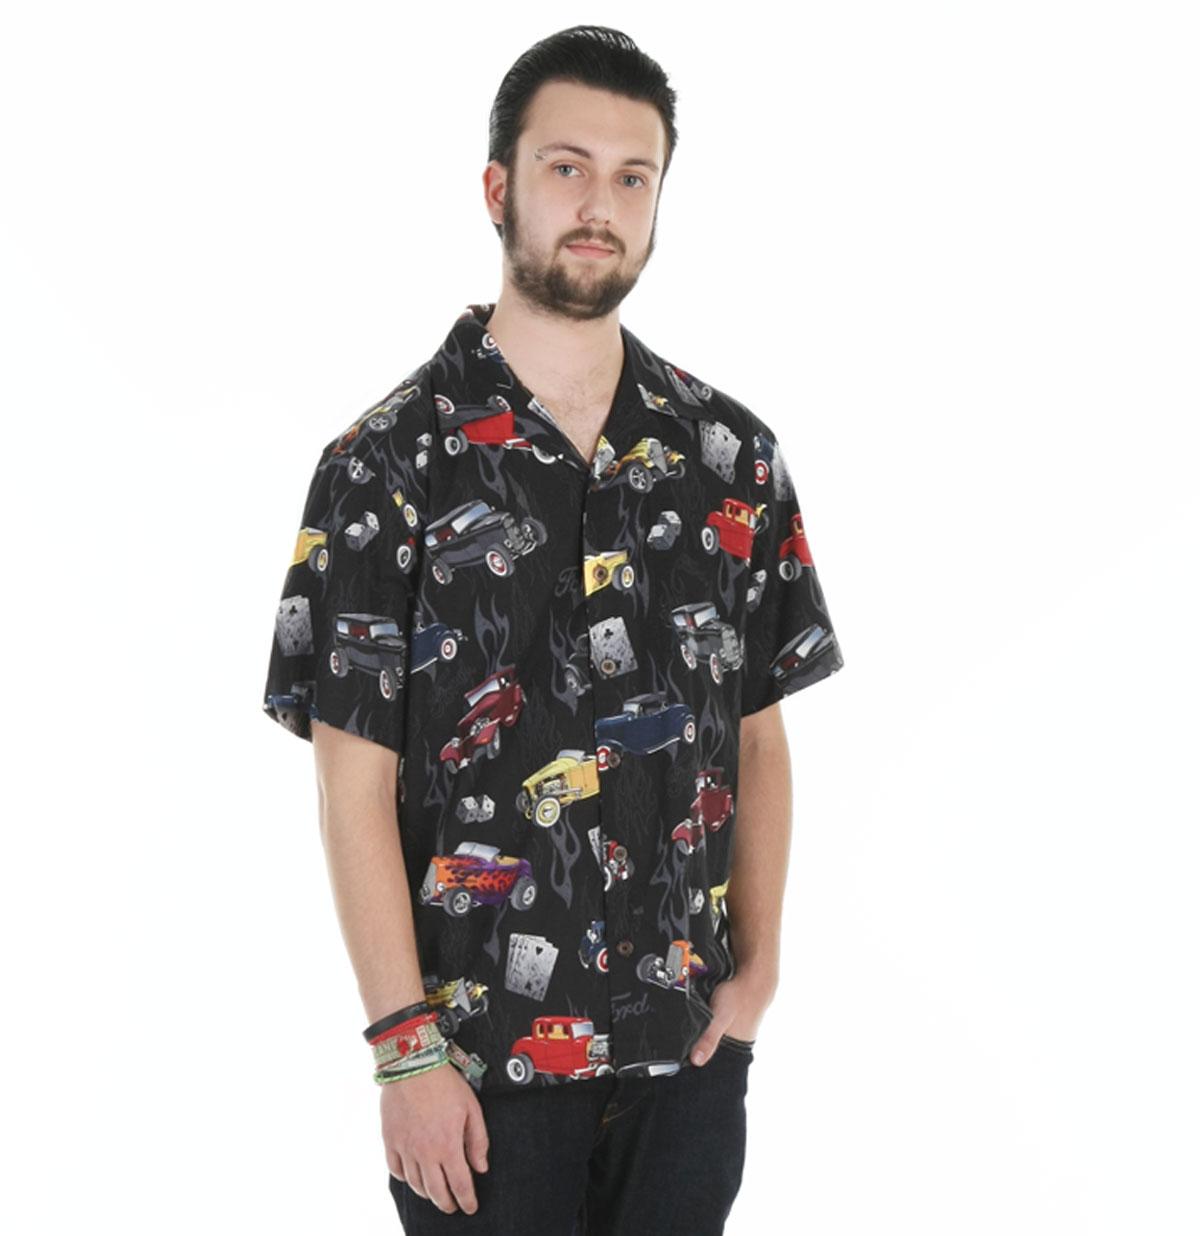 Ford Wild 32's Camp Shirt, Black